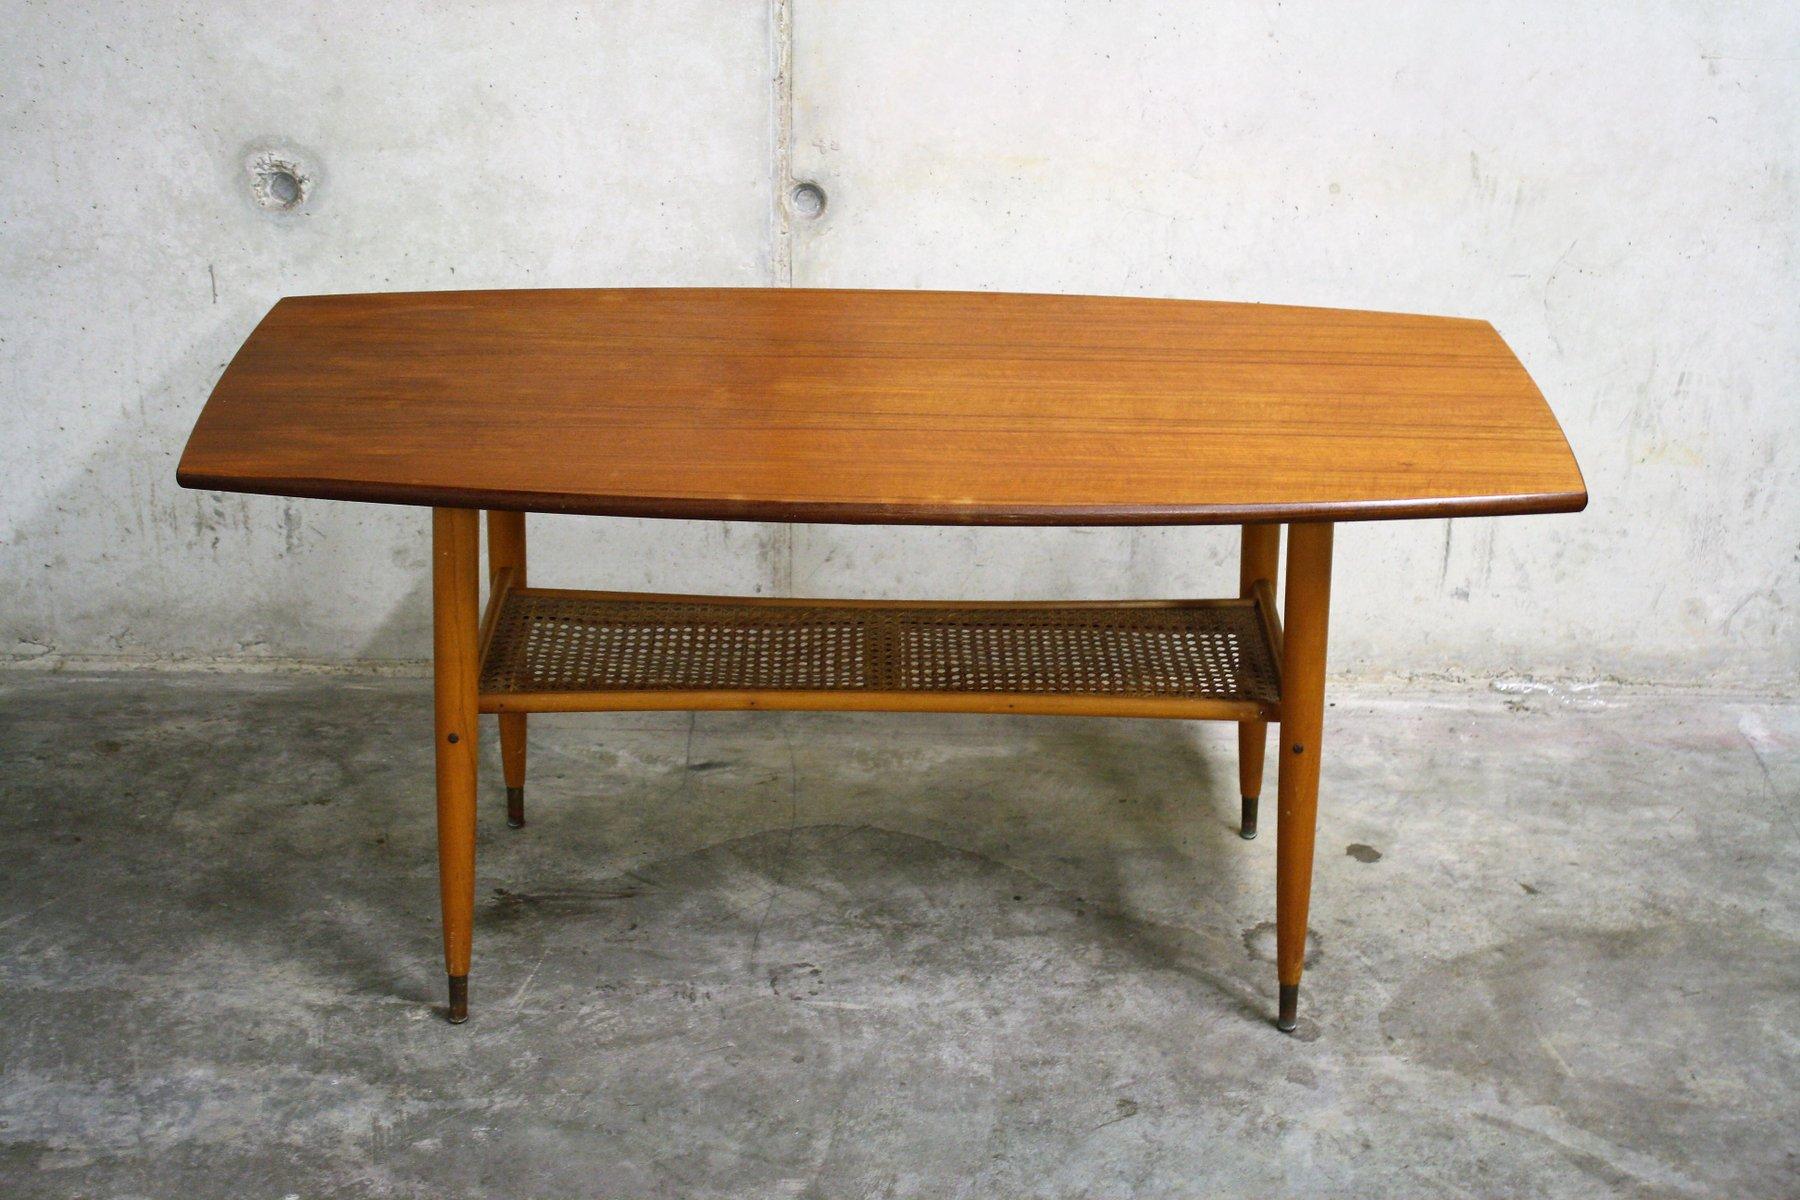 Scandinavian Teak Coffee Table With A Cane Shelf 1960s For Sale At Pamono